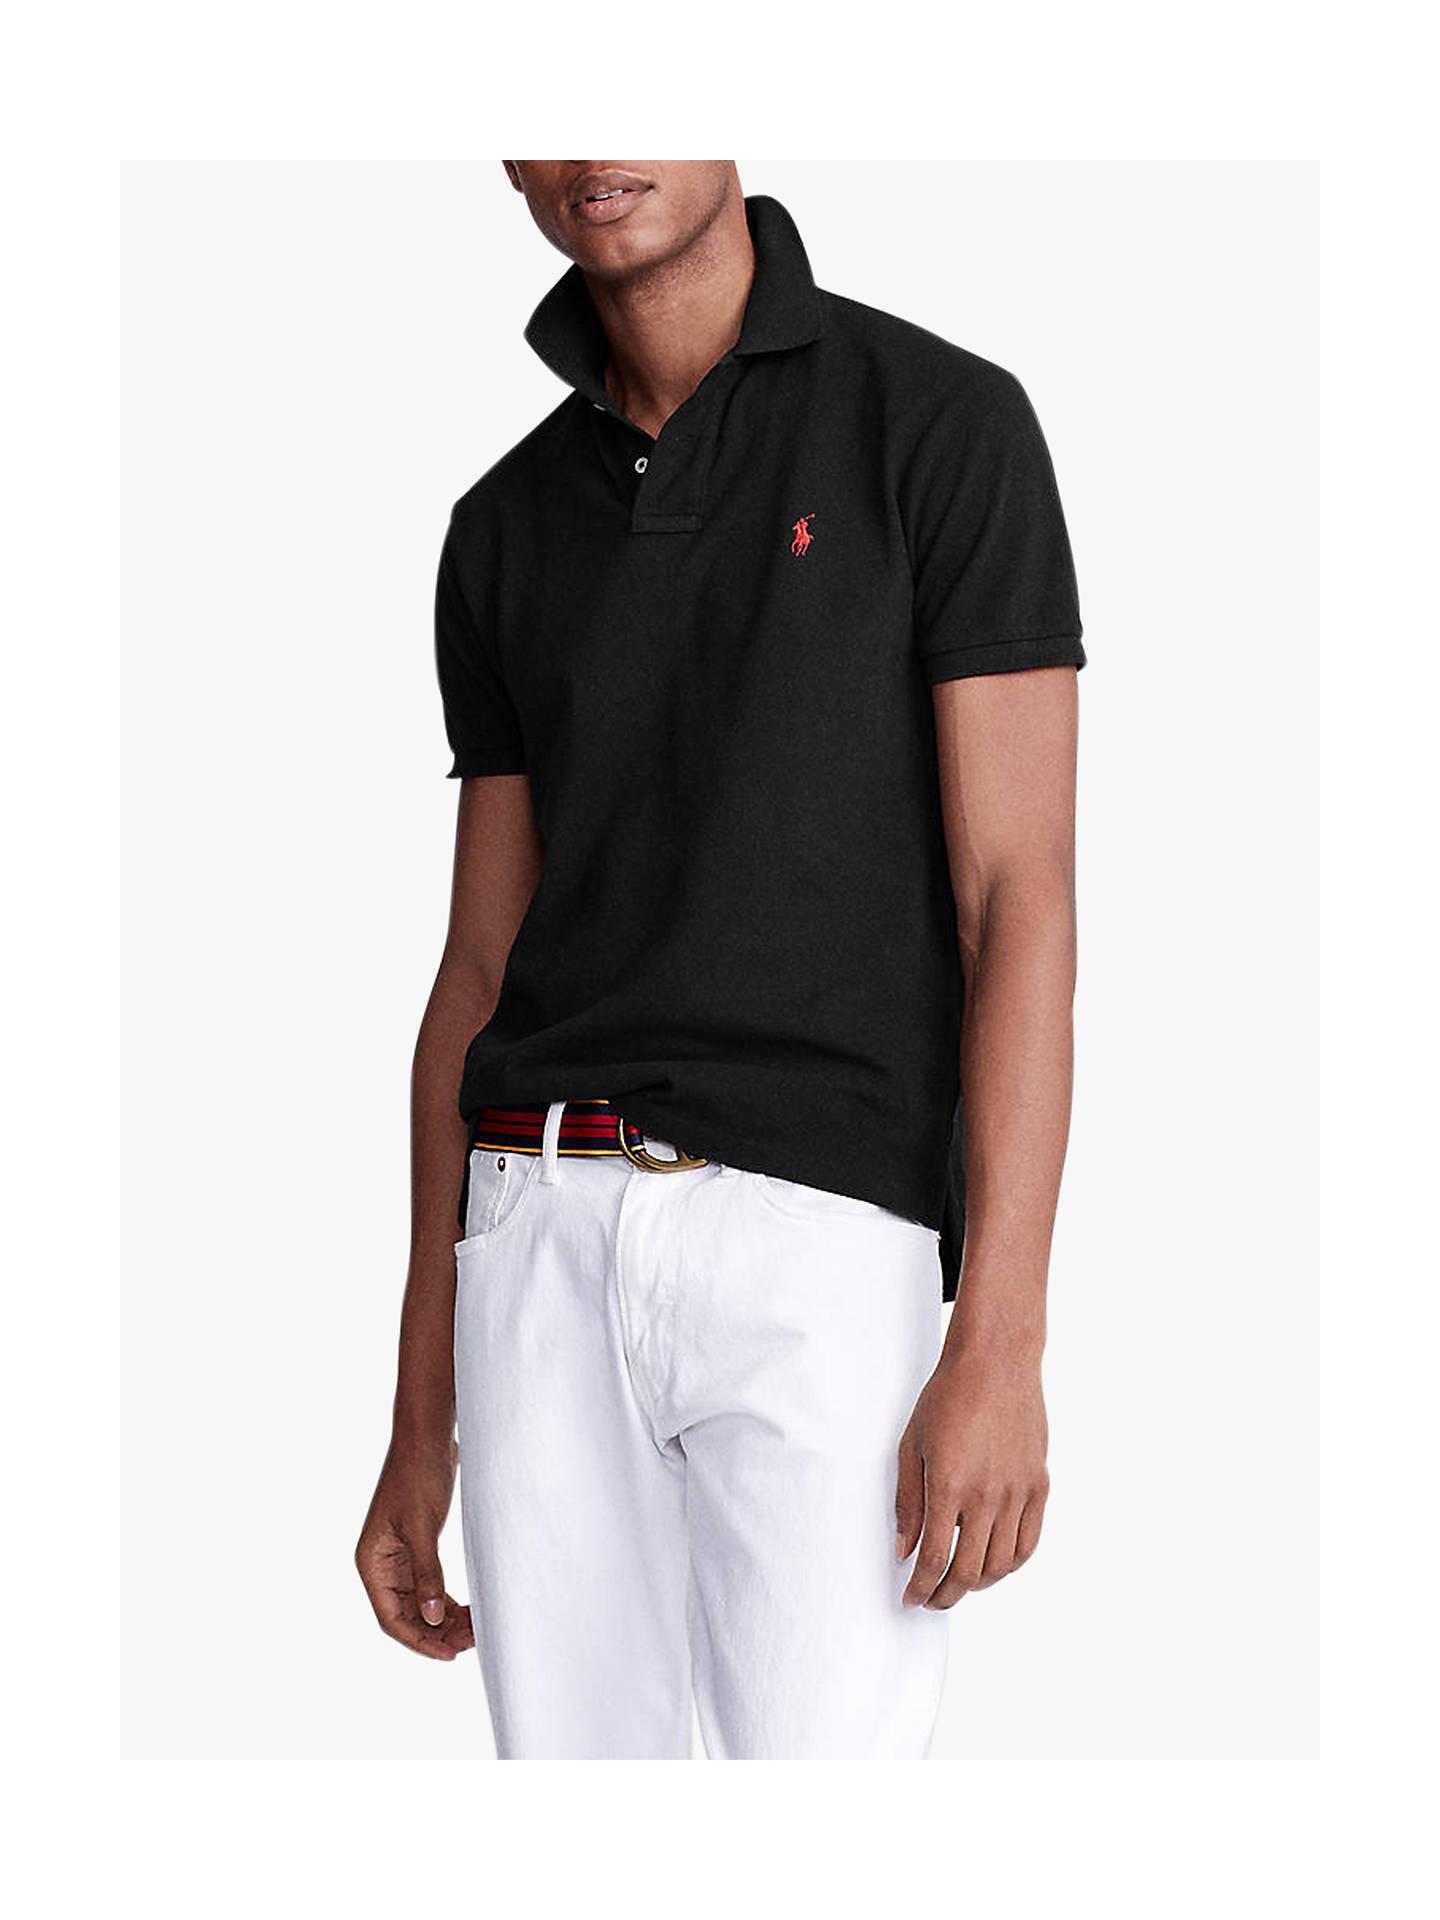 9f2a598e Polo Ralph Lauren Short Sleeve Slim Fit Polo Shirt, Polo Black